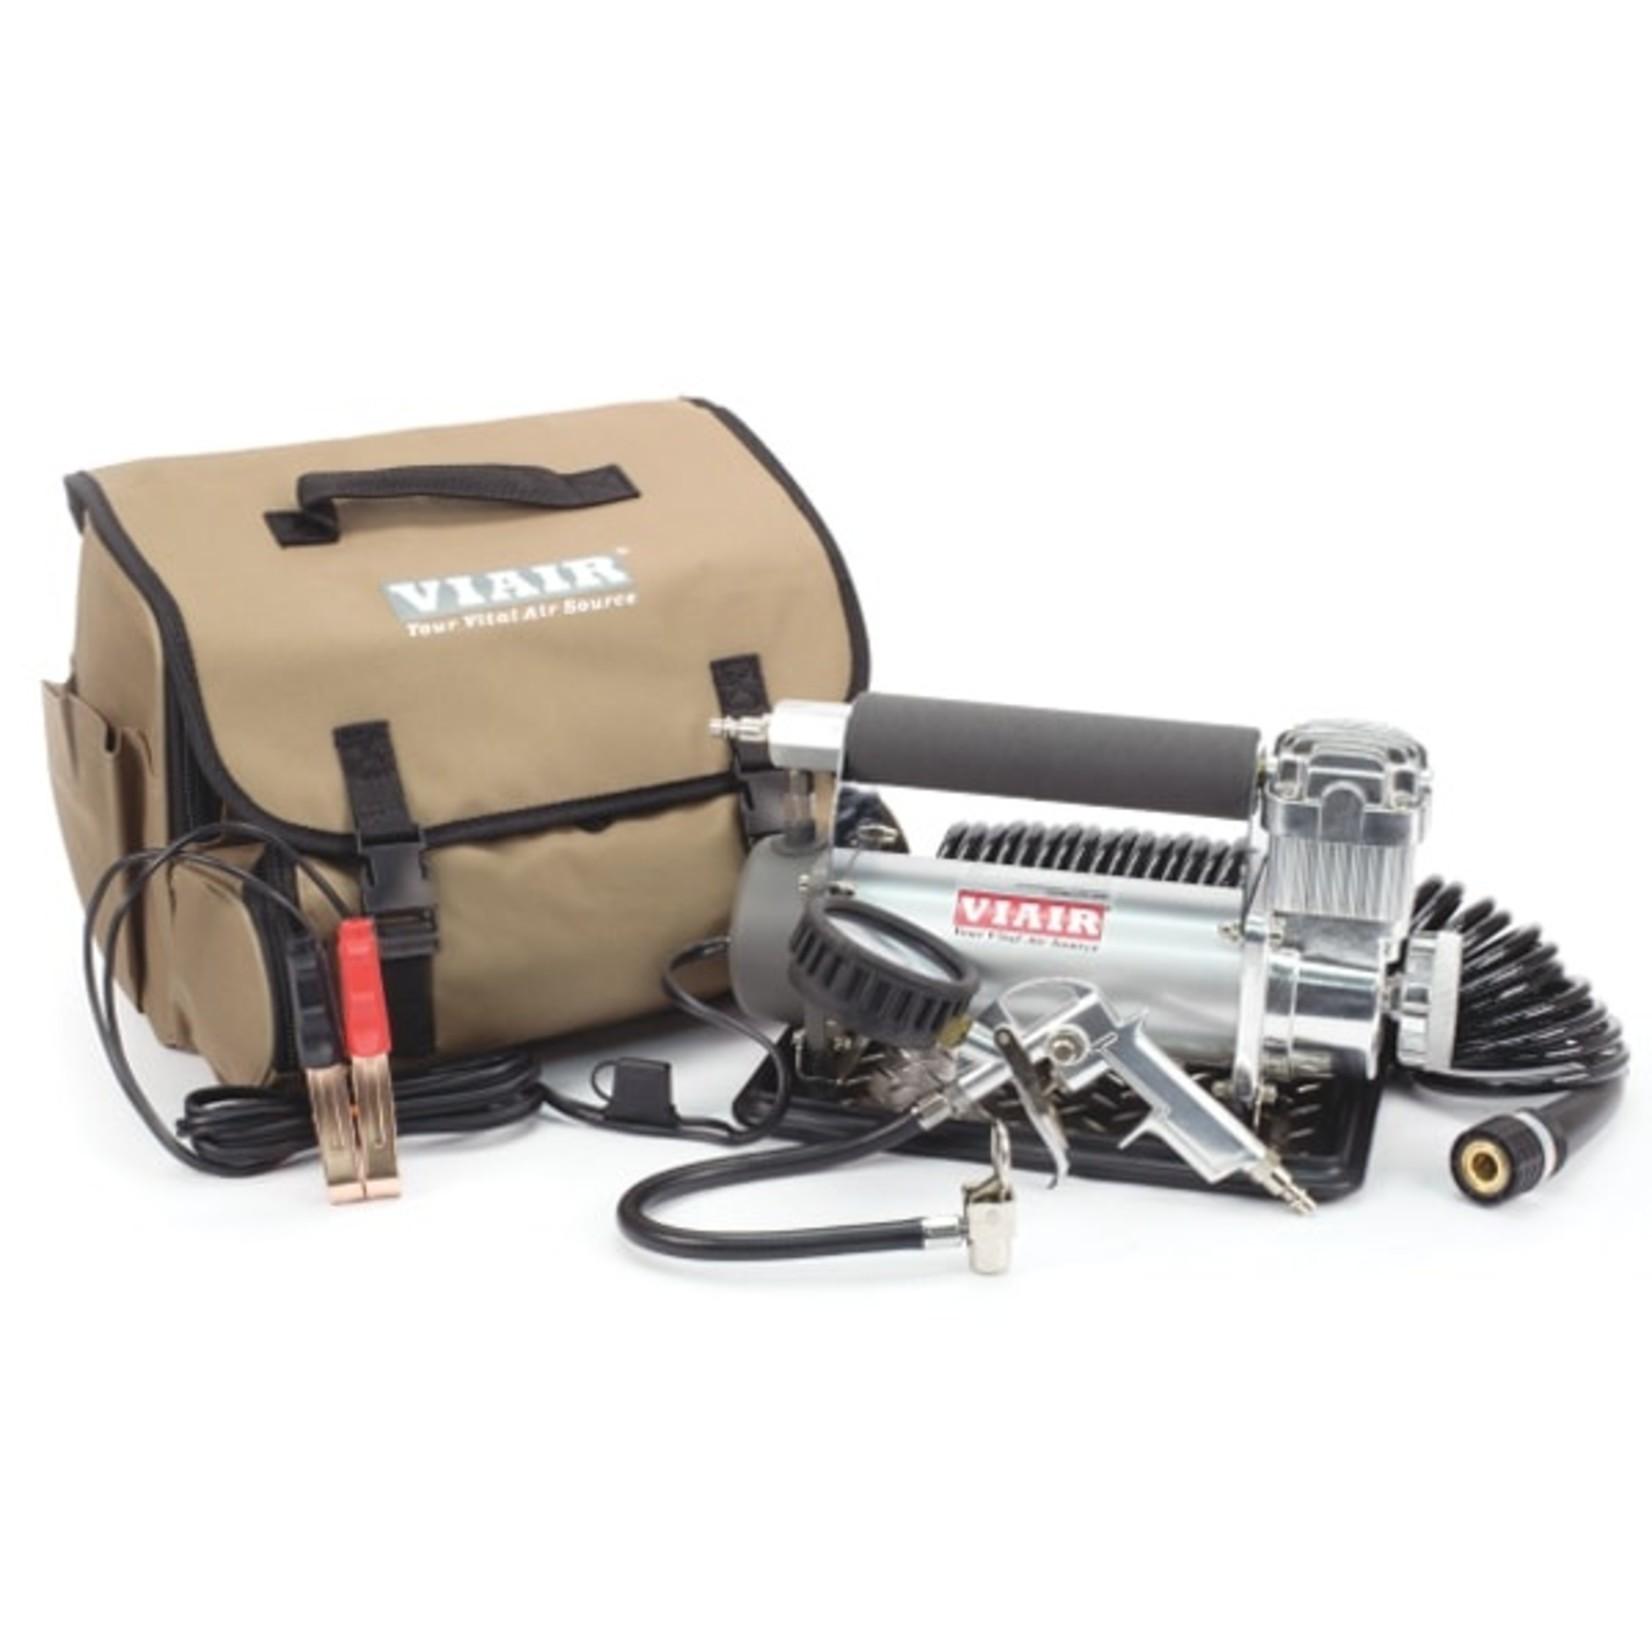 ViAir 450P Automatic Compressor Kit